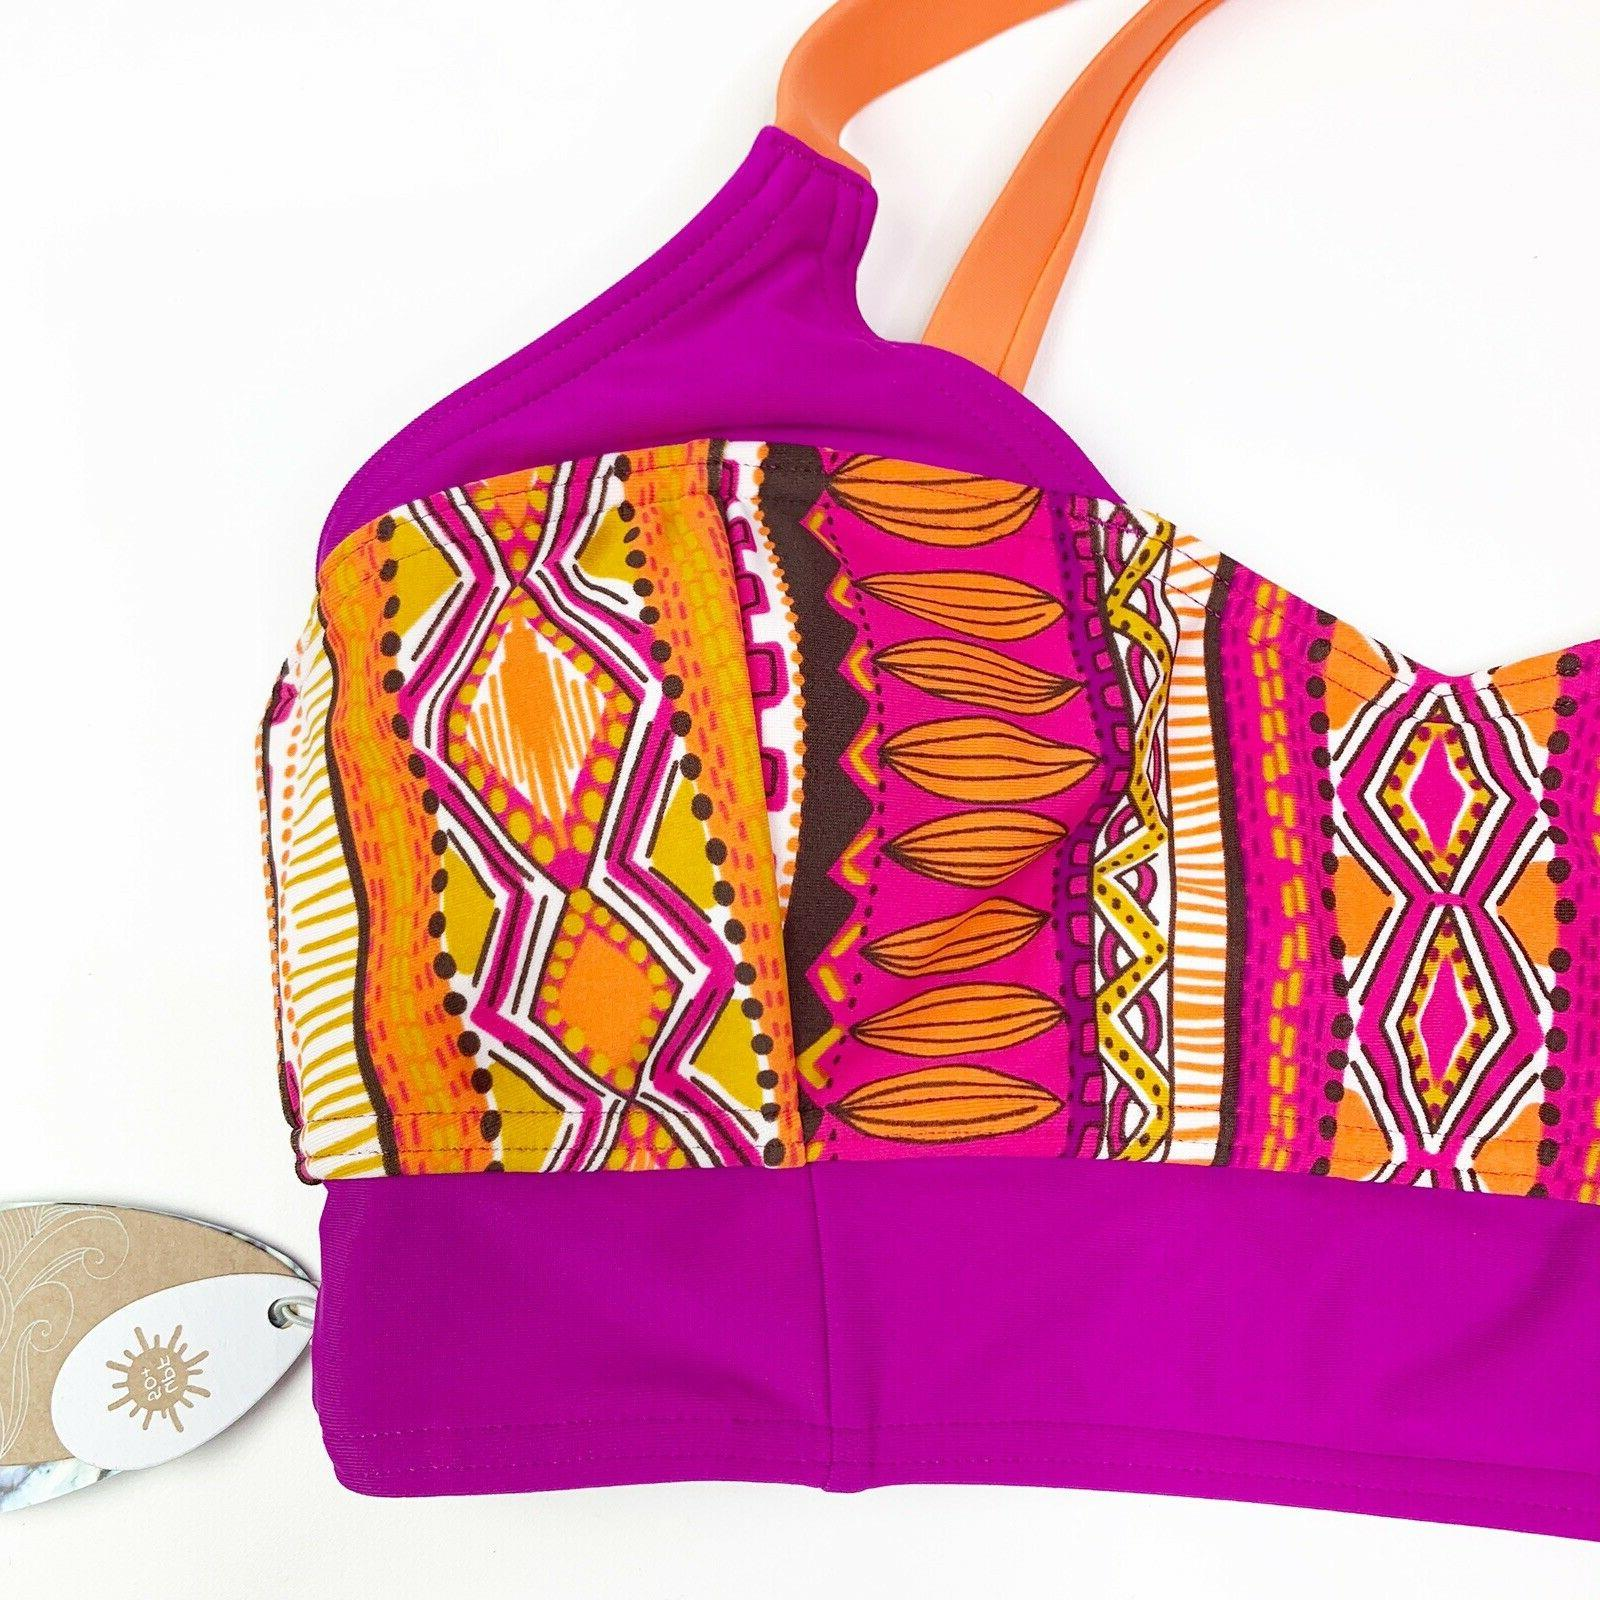 $65 NWT Prana Vibrant Bathing Top S